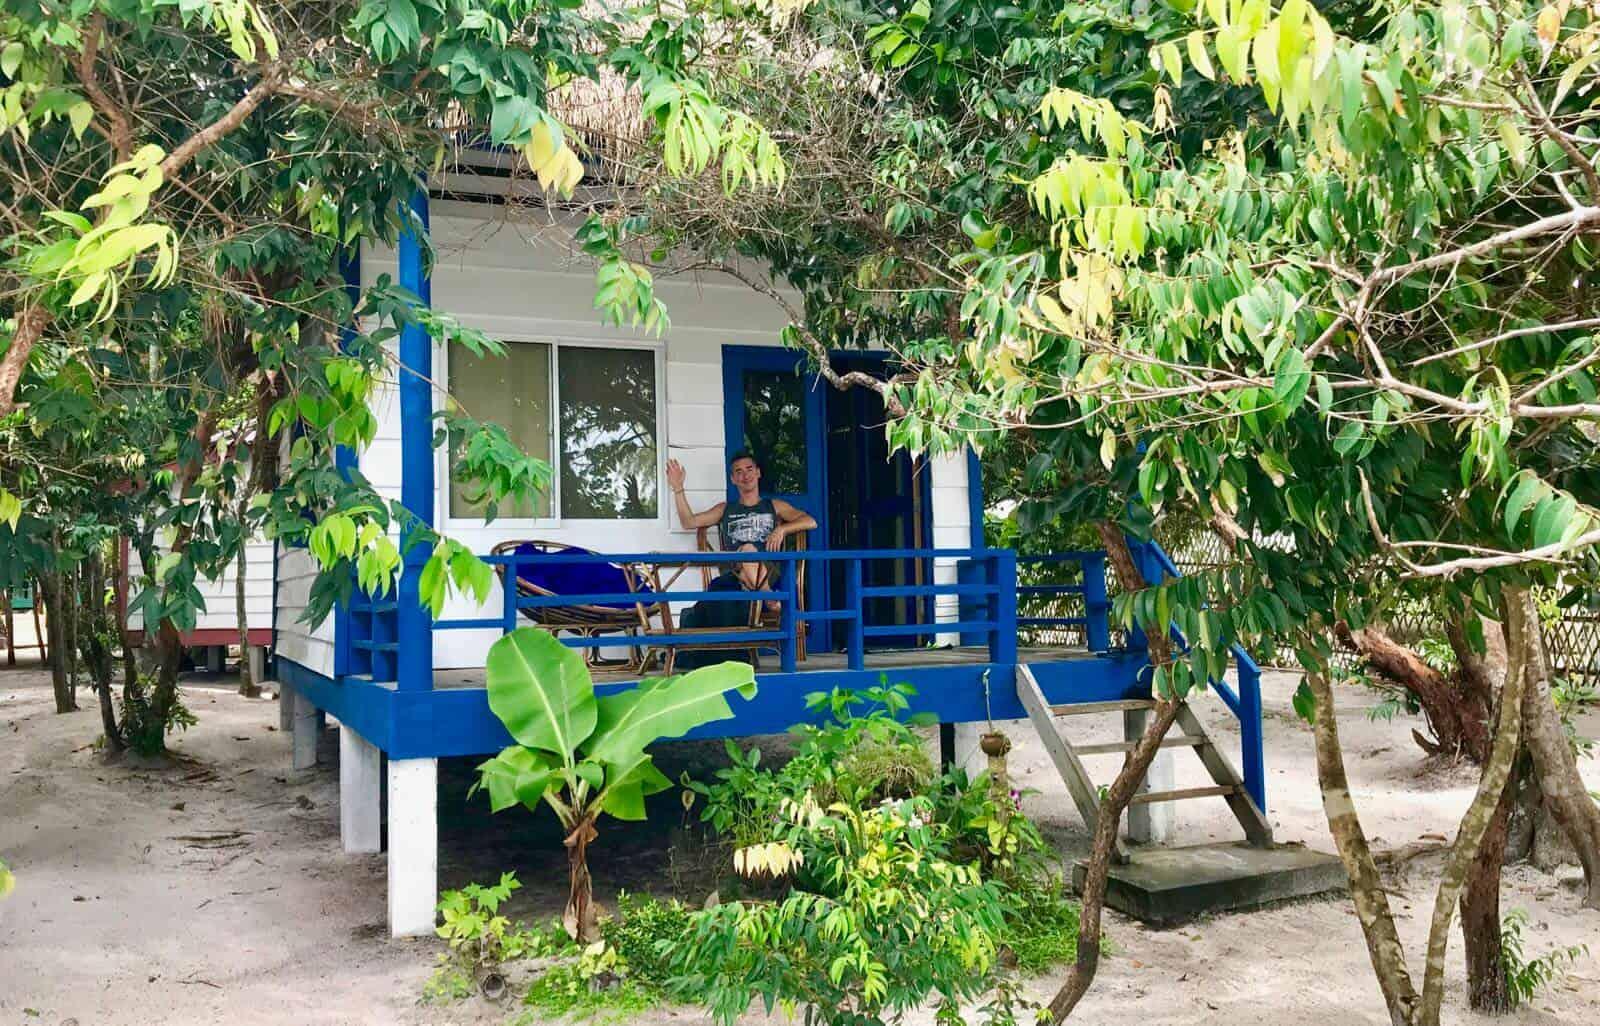 Natural Island Resort Koh Rong Sanloem Cambodia Phil betternotstop